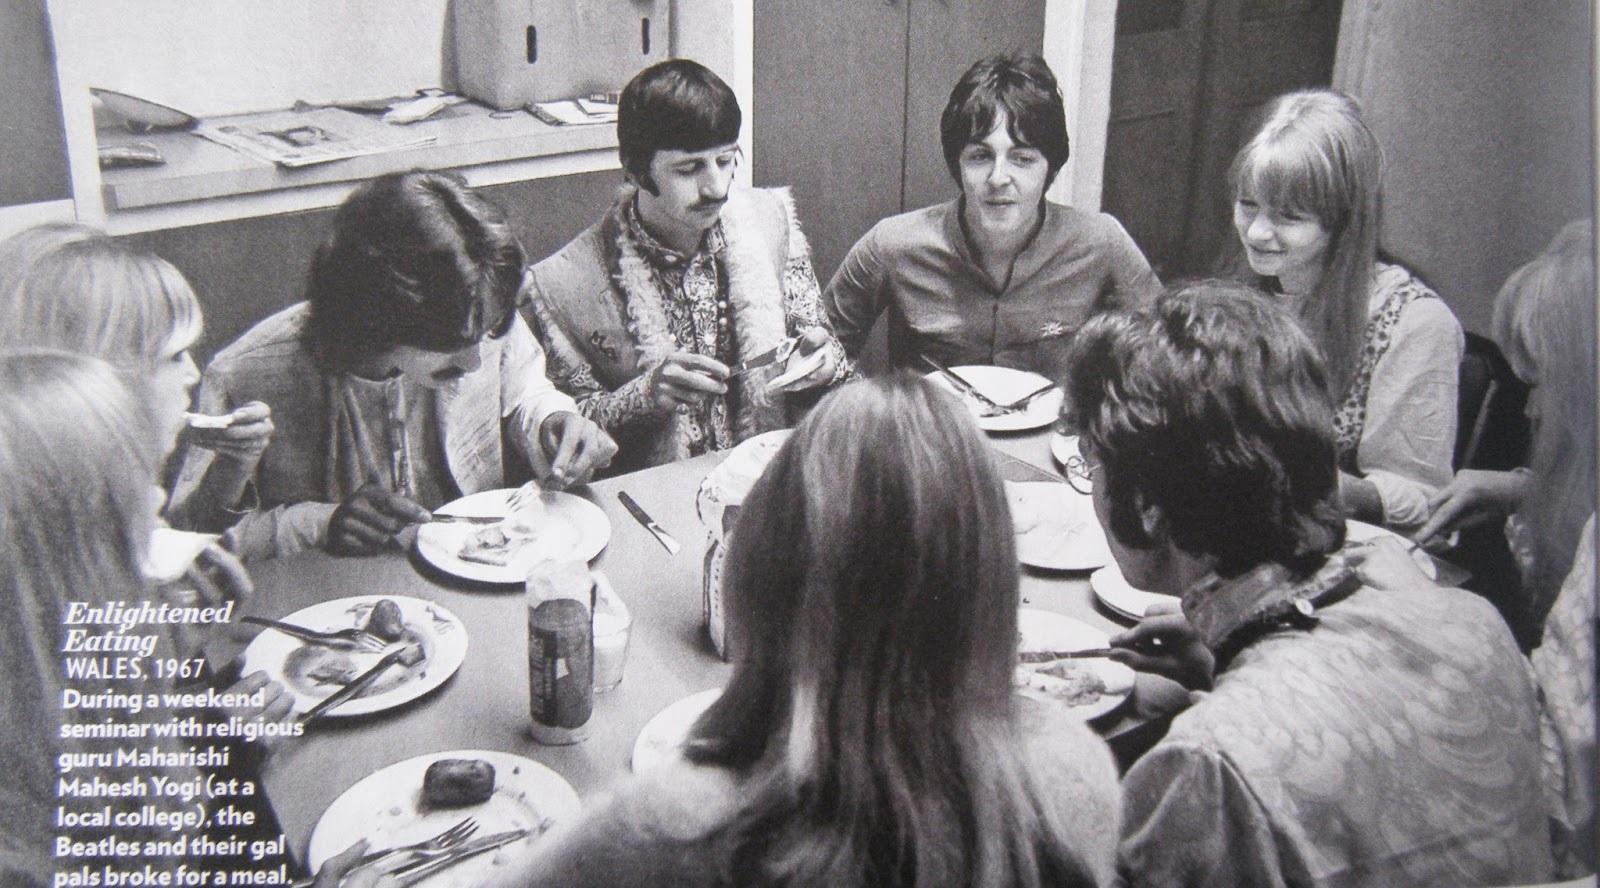 Col Guru Maharishi Mahesh Yogi, I Beatles e le loro ragazze Pattie, Jenny, Jane, Cynthia & Marianne Faithful